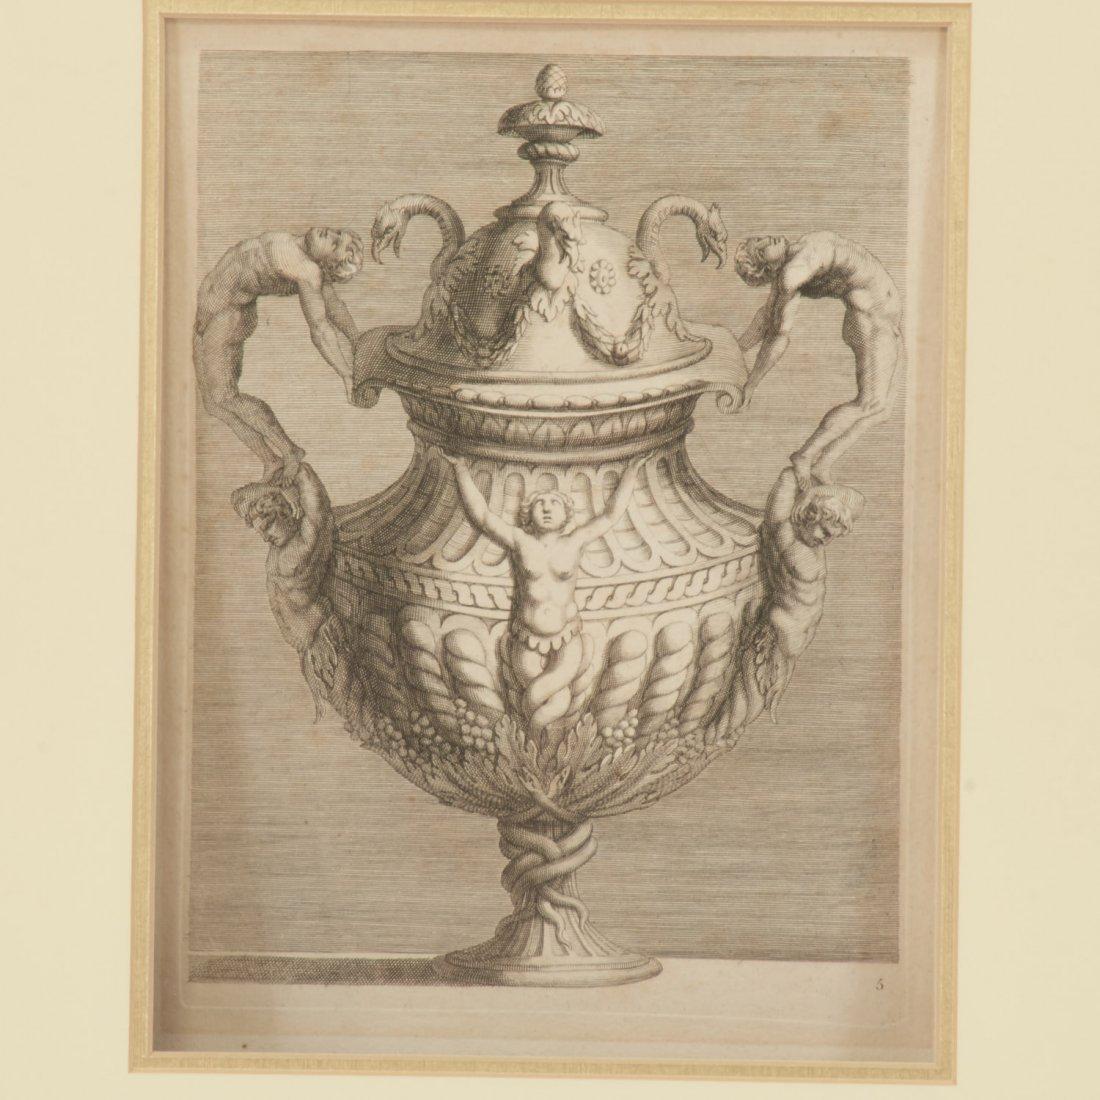 Pair Roman Antiquity engravings after Piranesi - 3